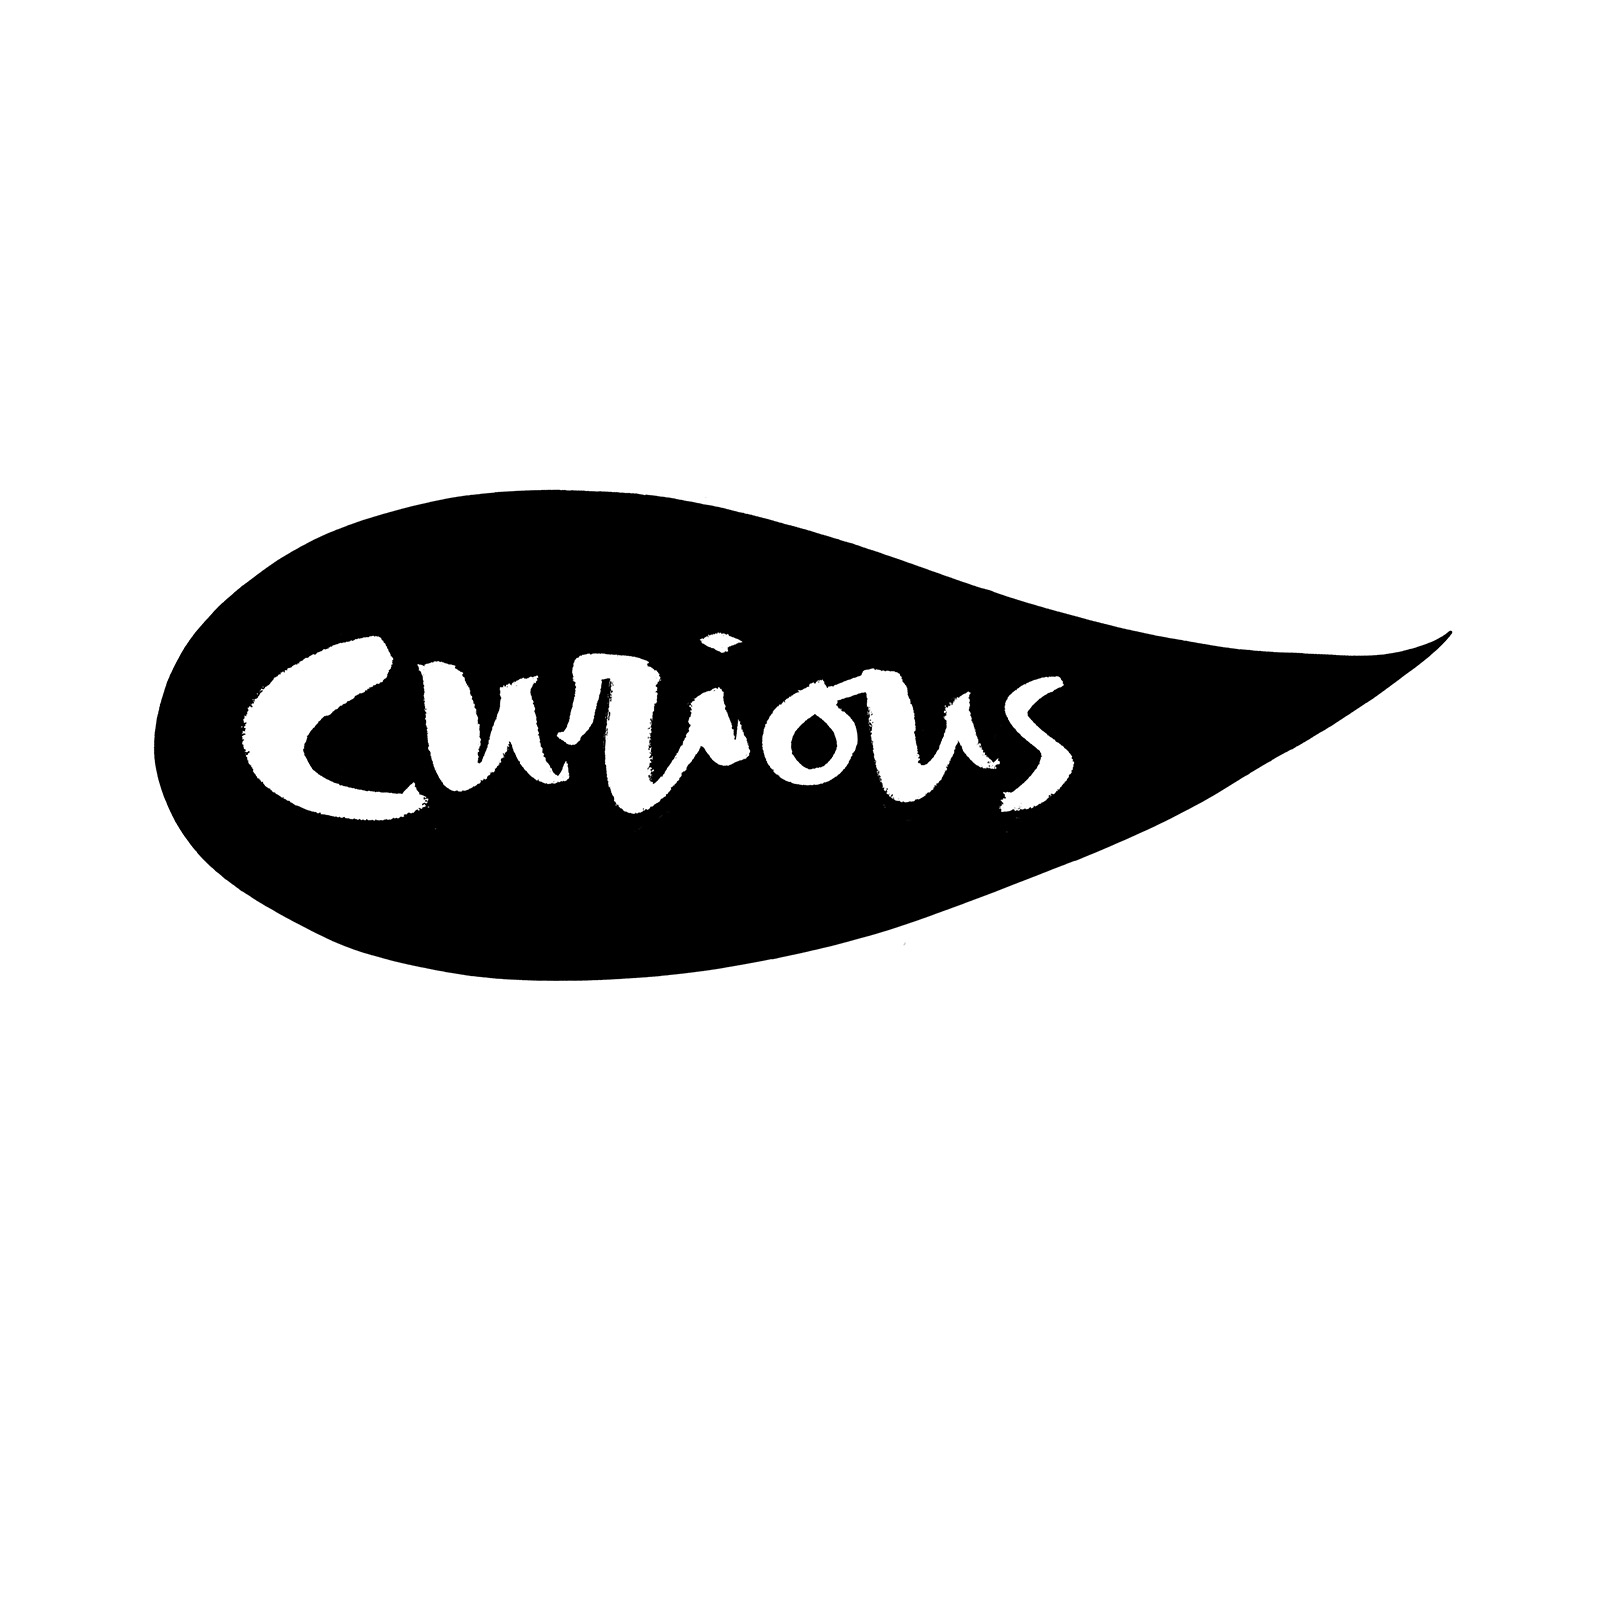 curious_ltg.jpg